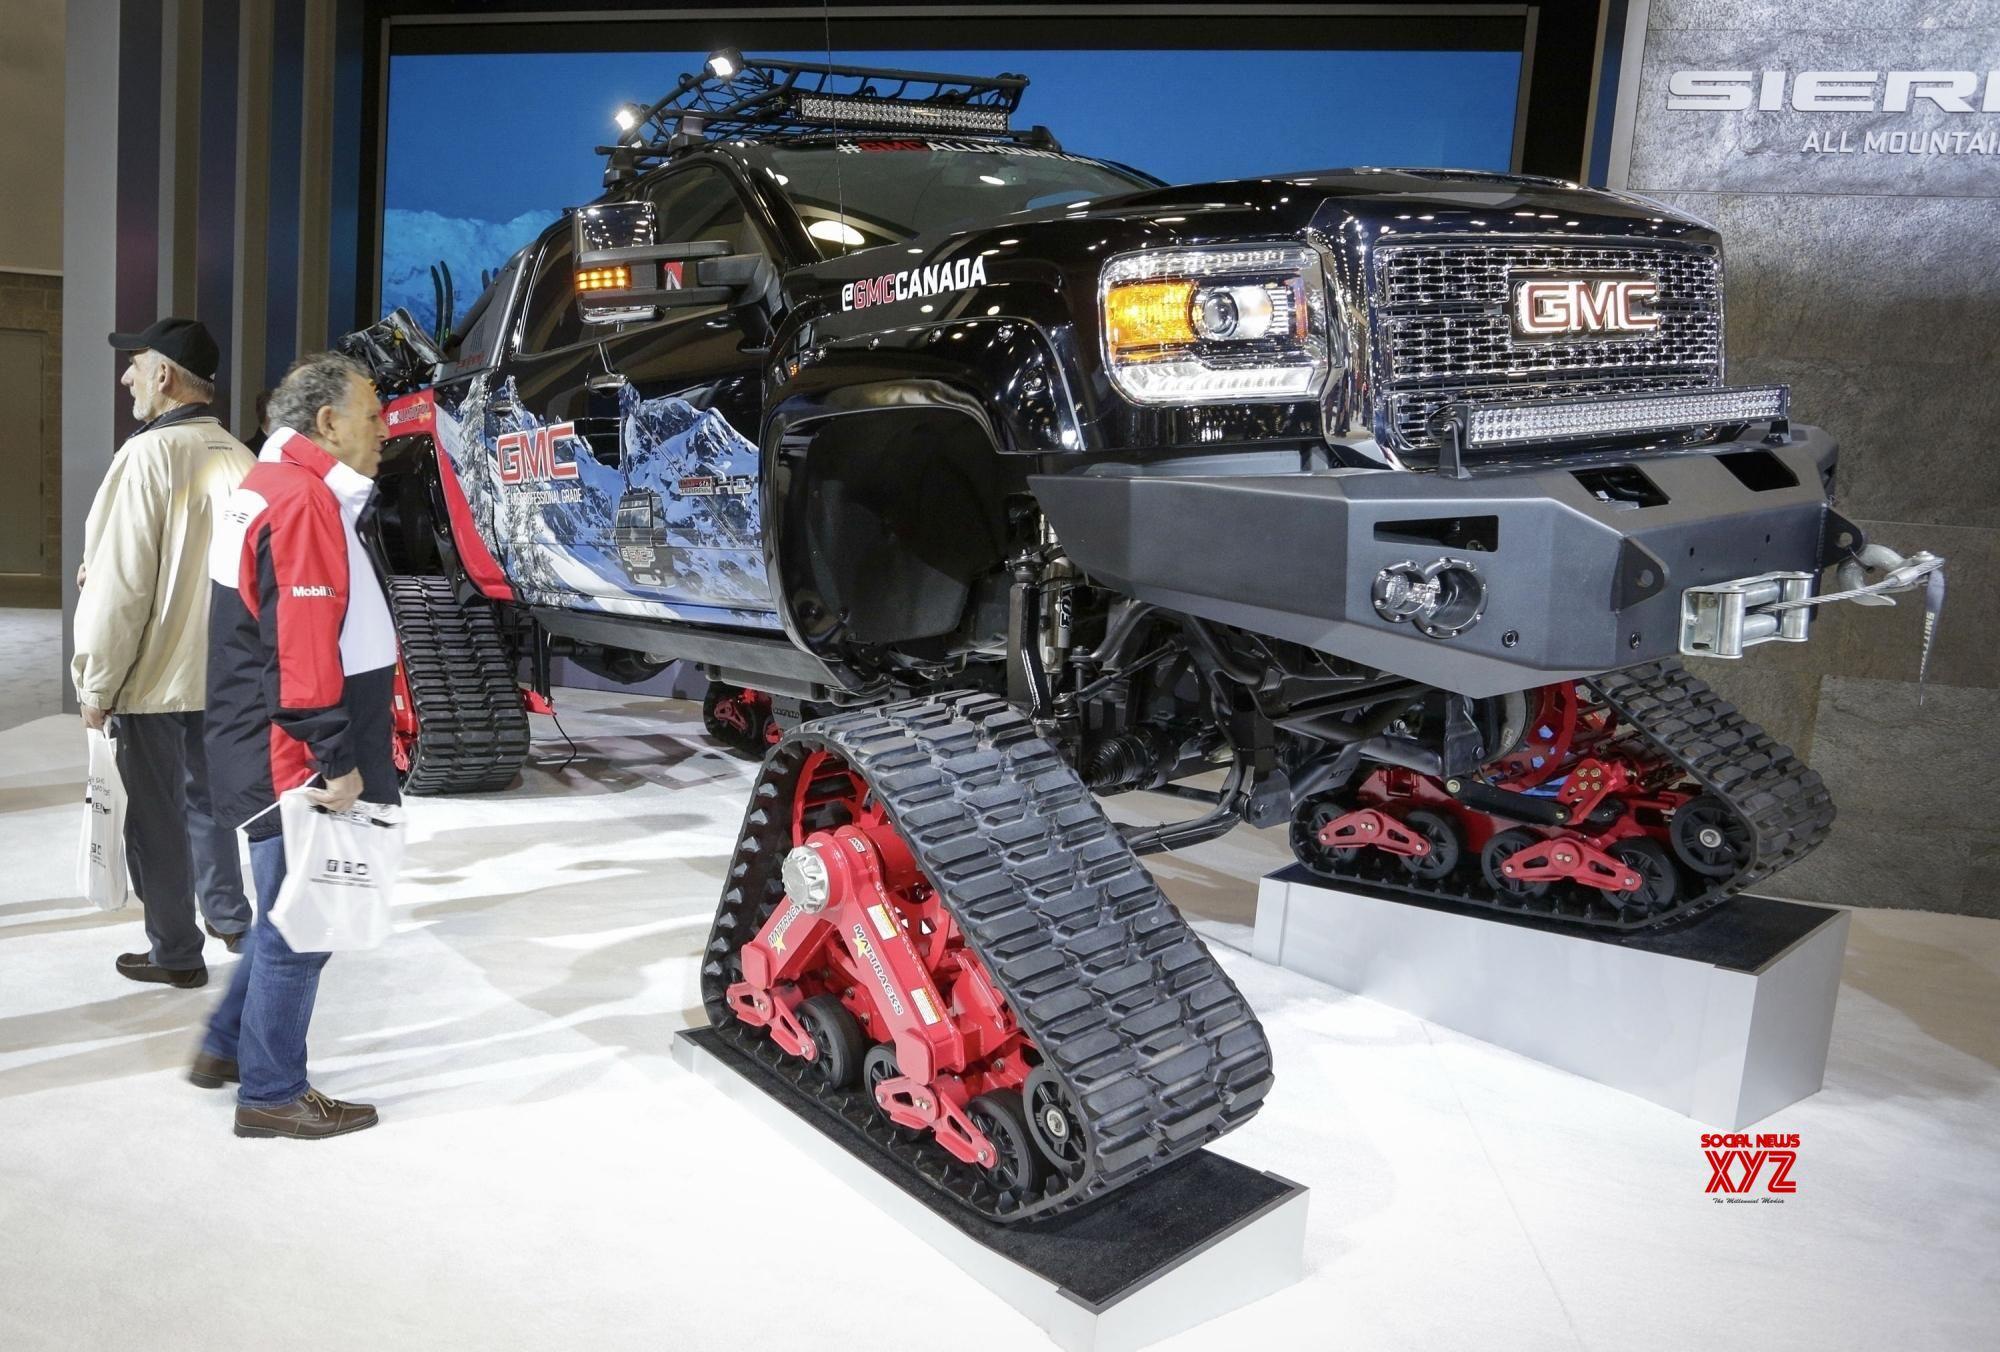 CANADA VANCOUVER AUTO SHOW Gallery Social News XYZ - Car show vancouver 2018